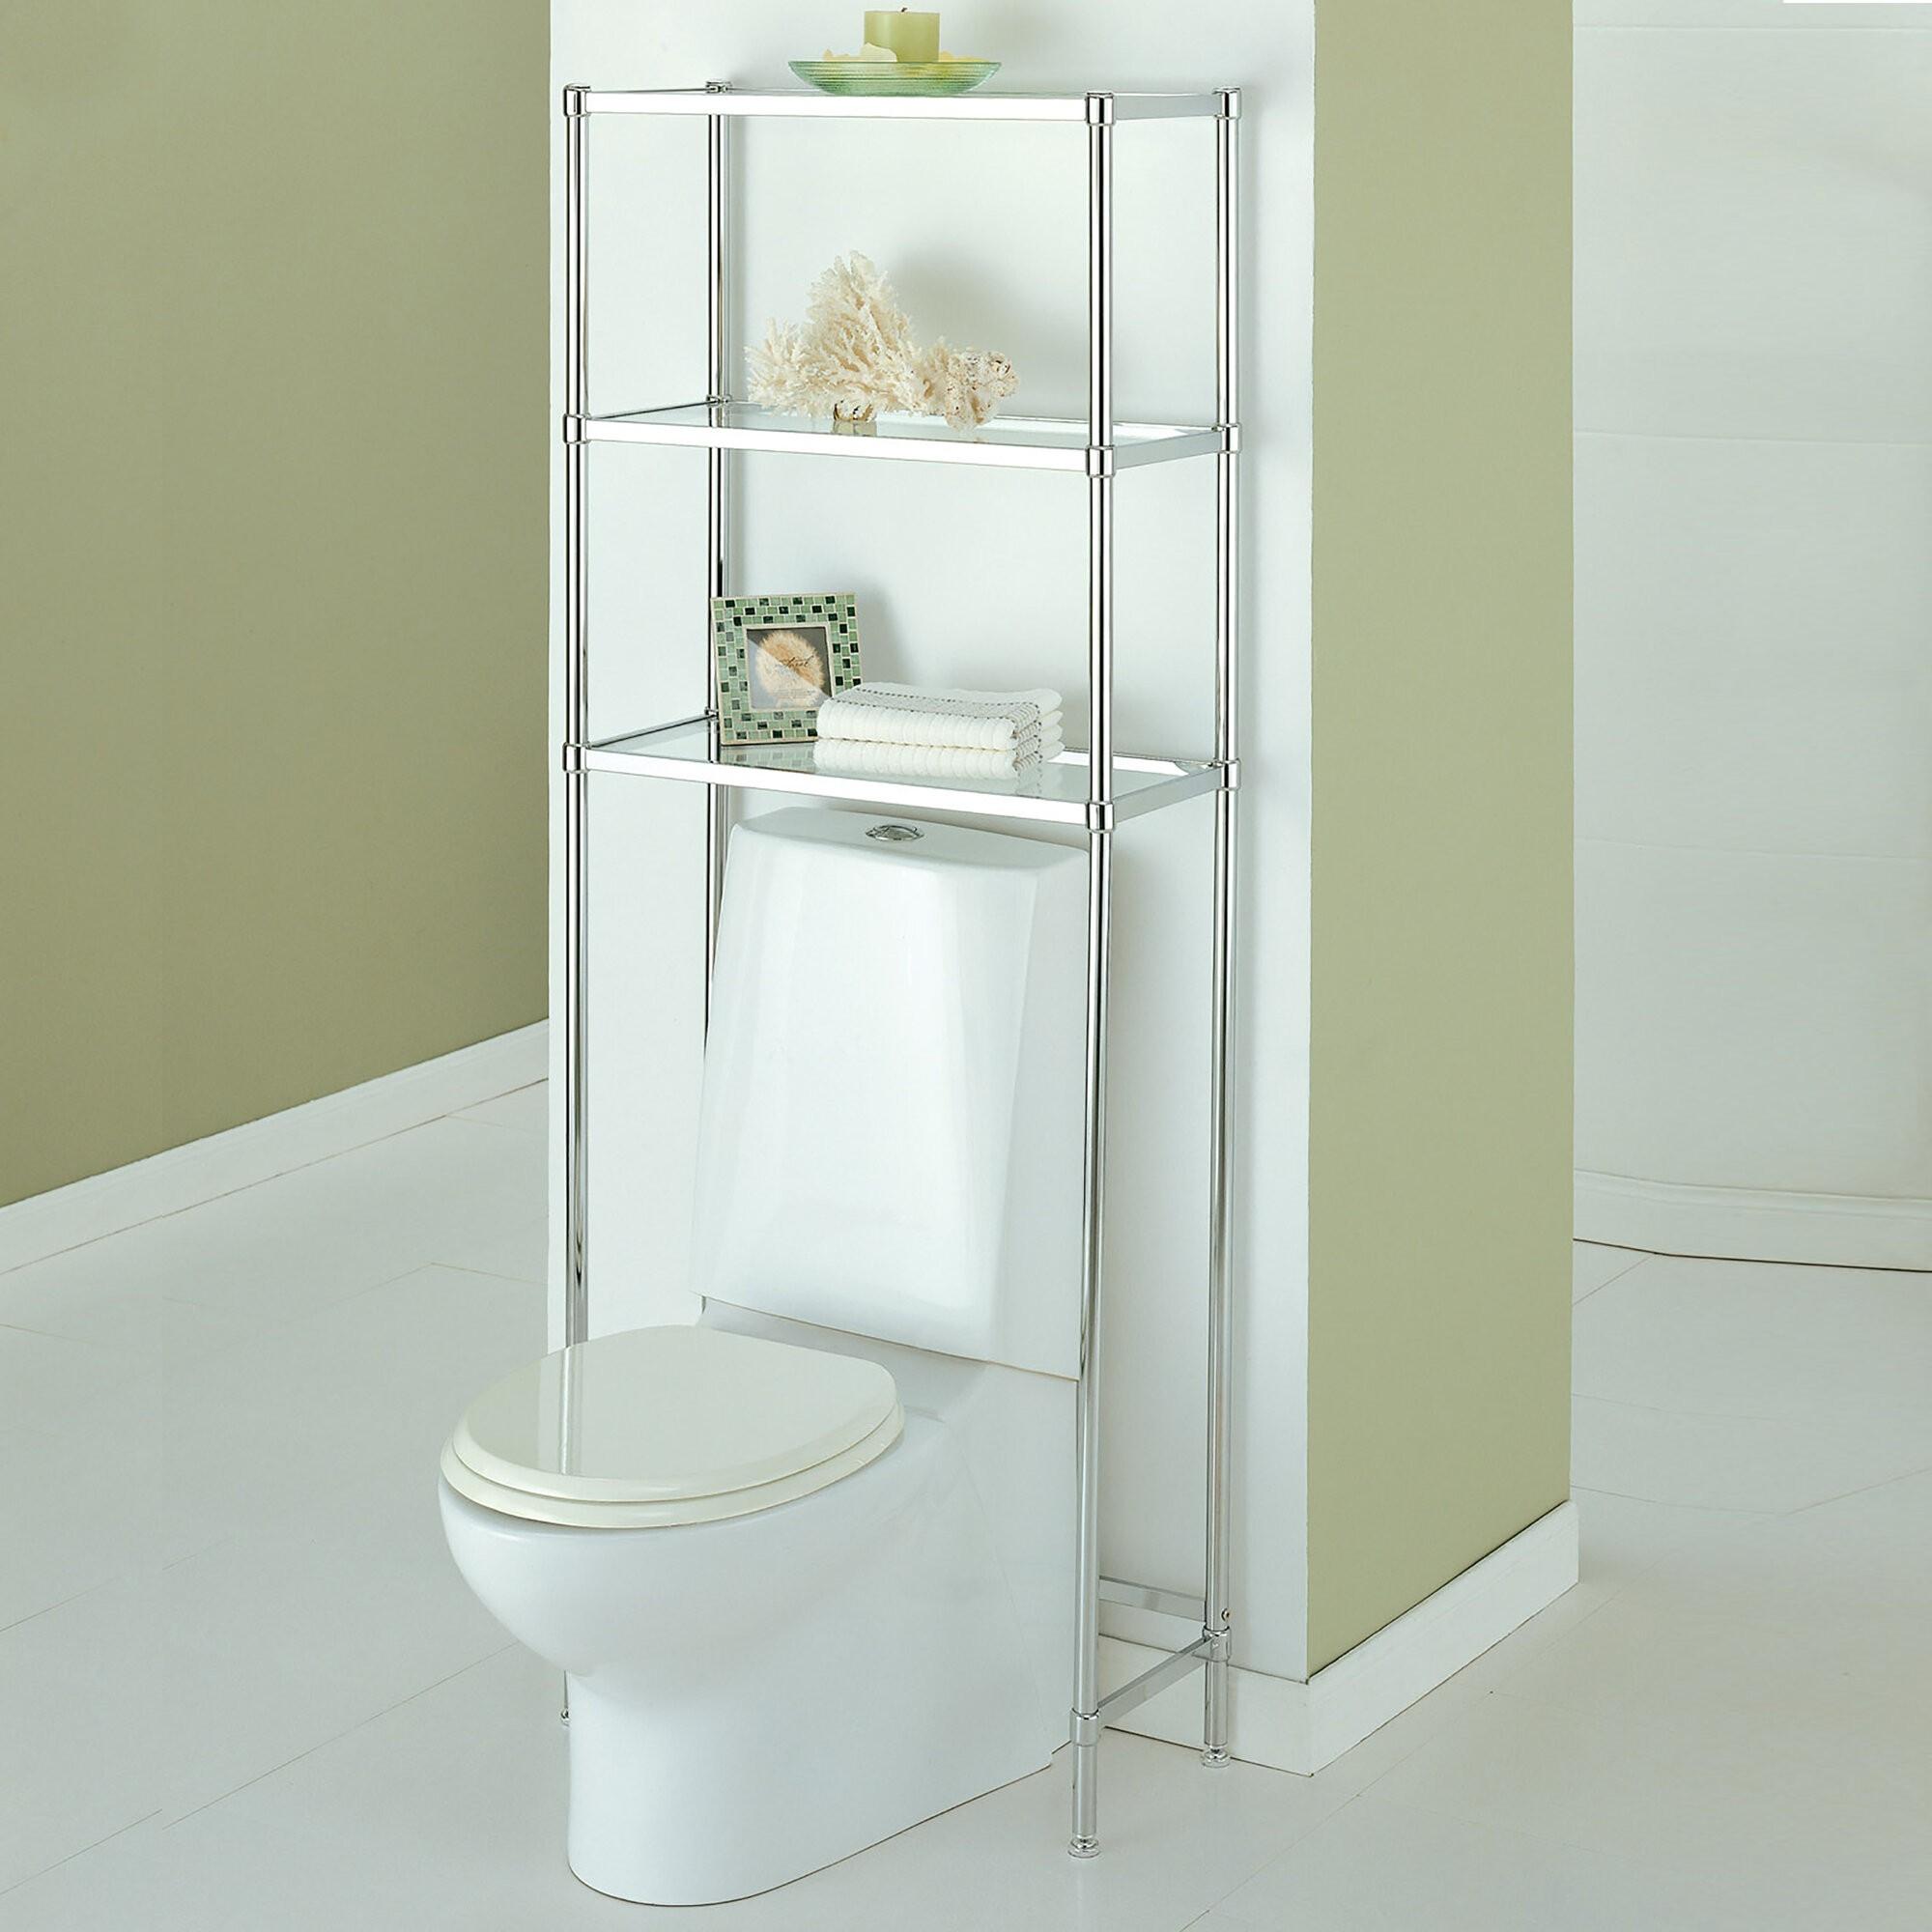 Modern Over The Toilet Storage Ideas